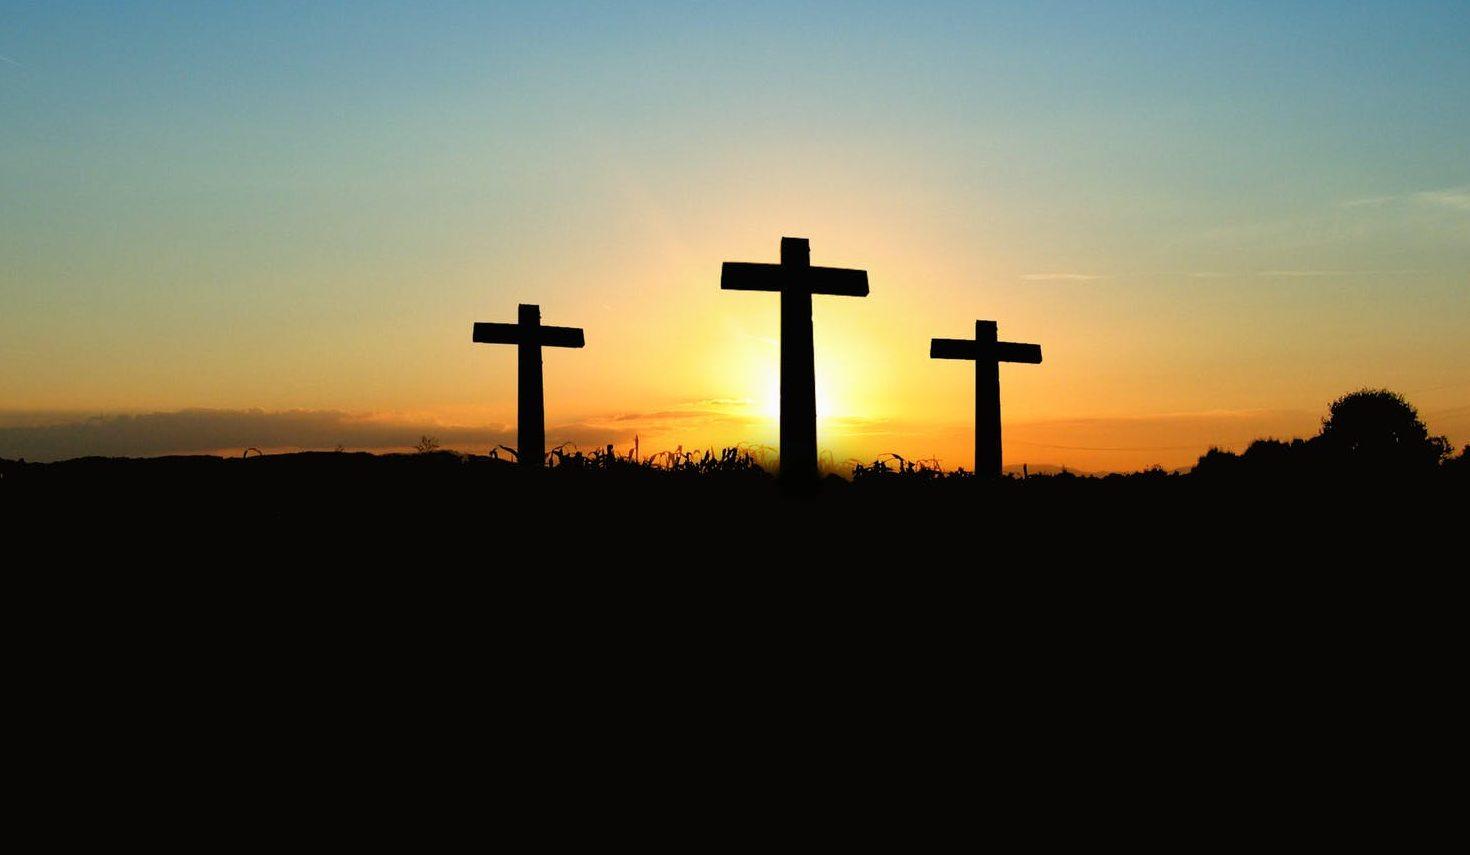 Following Jesus: A Testimony